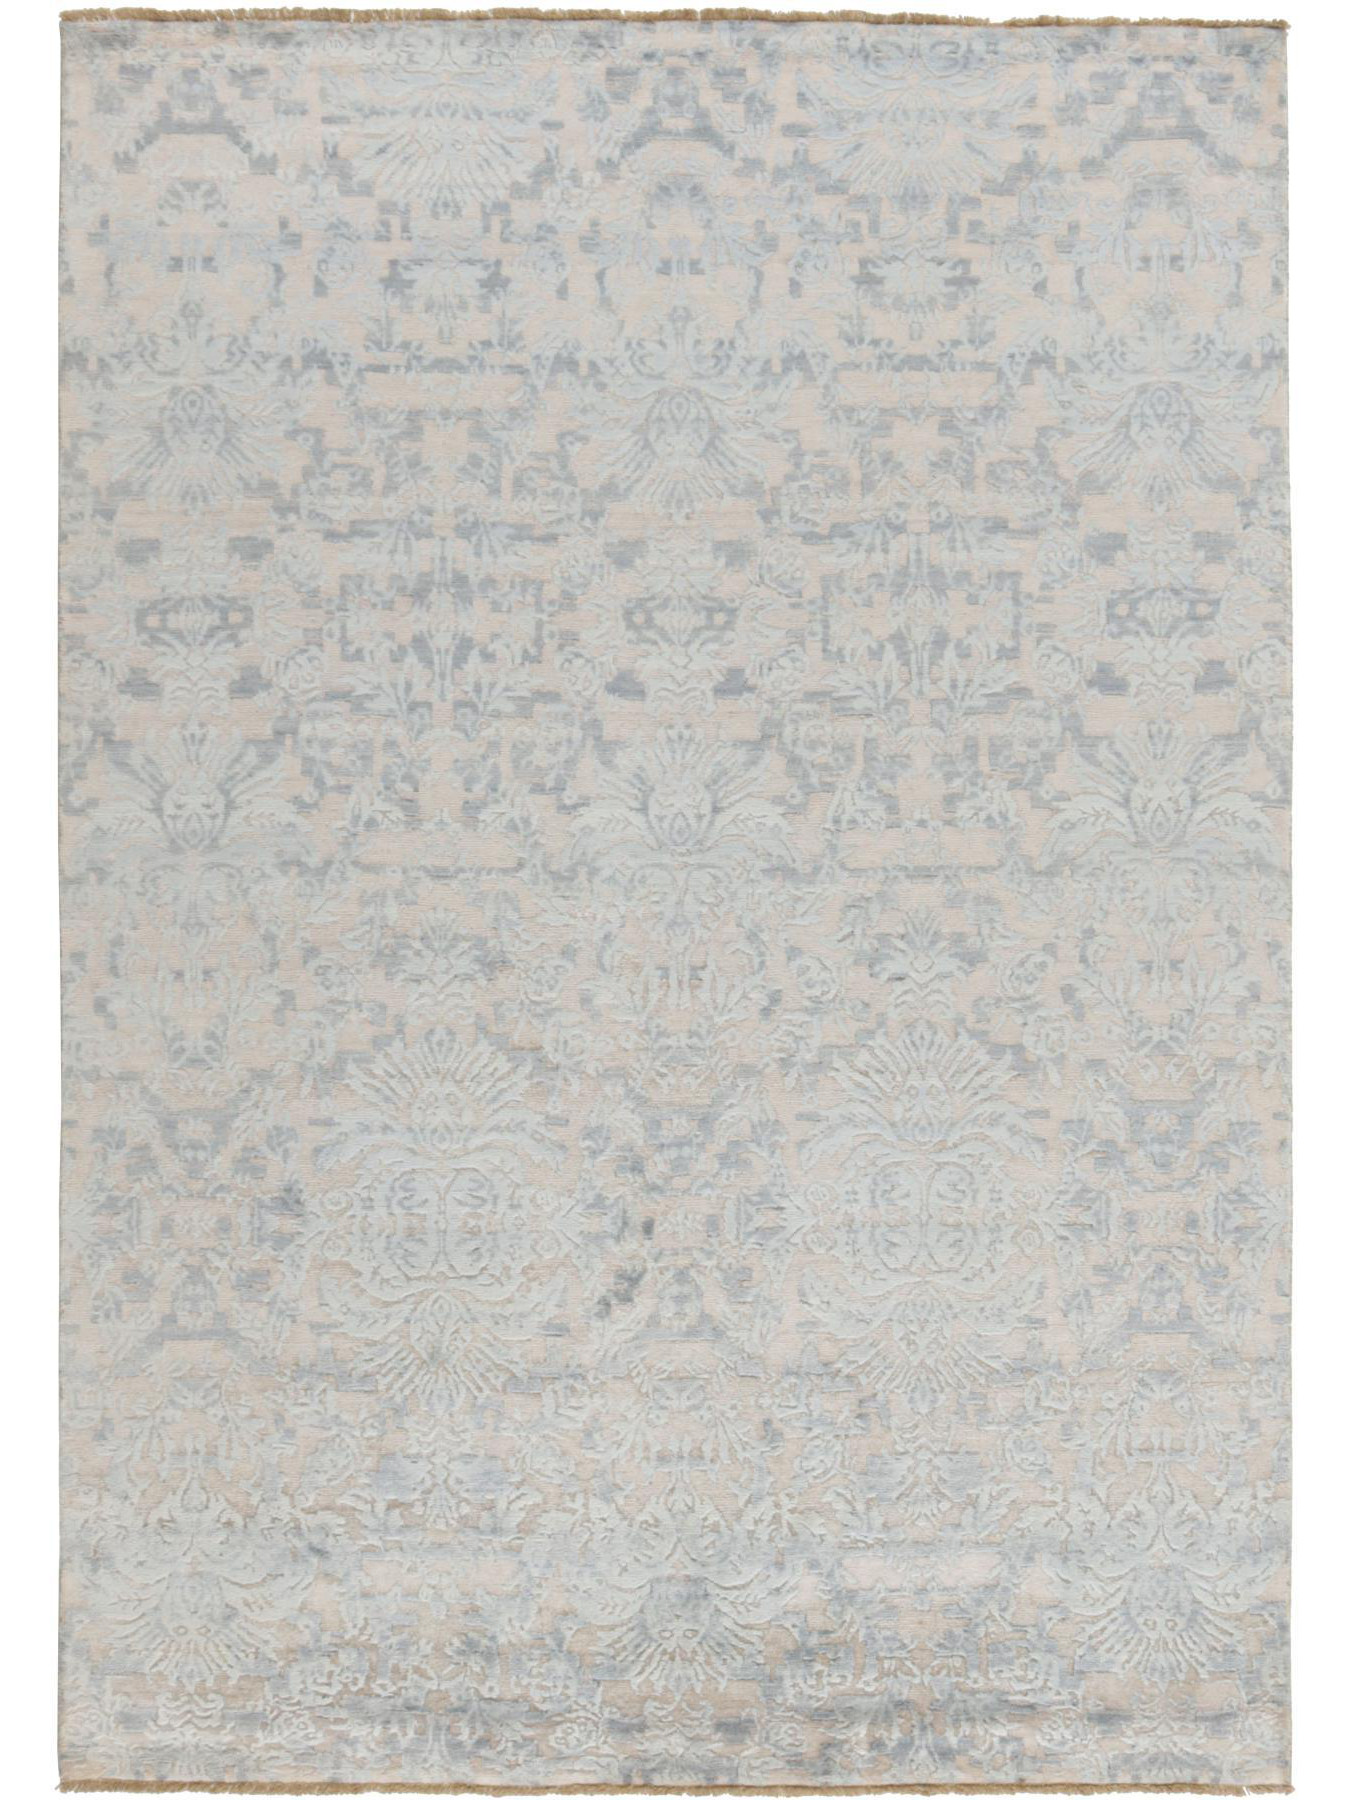 Luxury tapijten - Damask-AL-501B HB-104/D0-13/HB-139